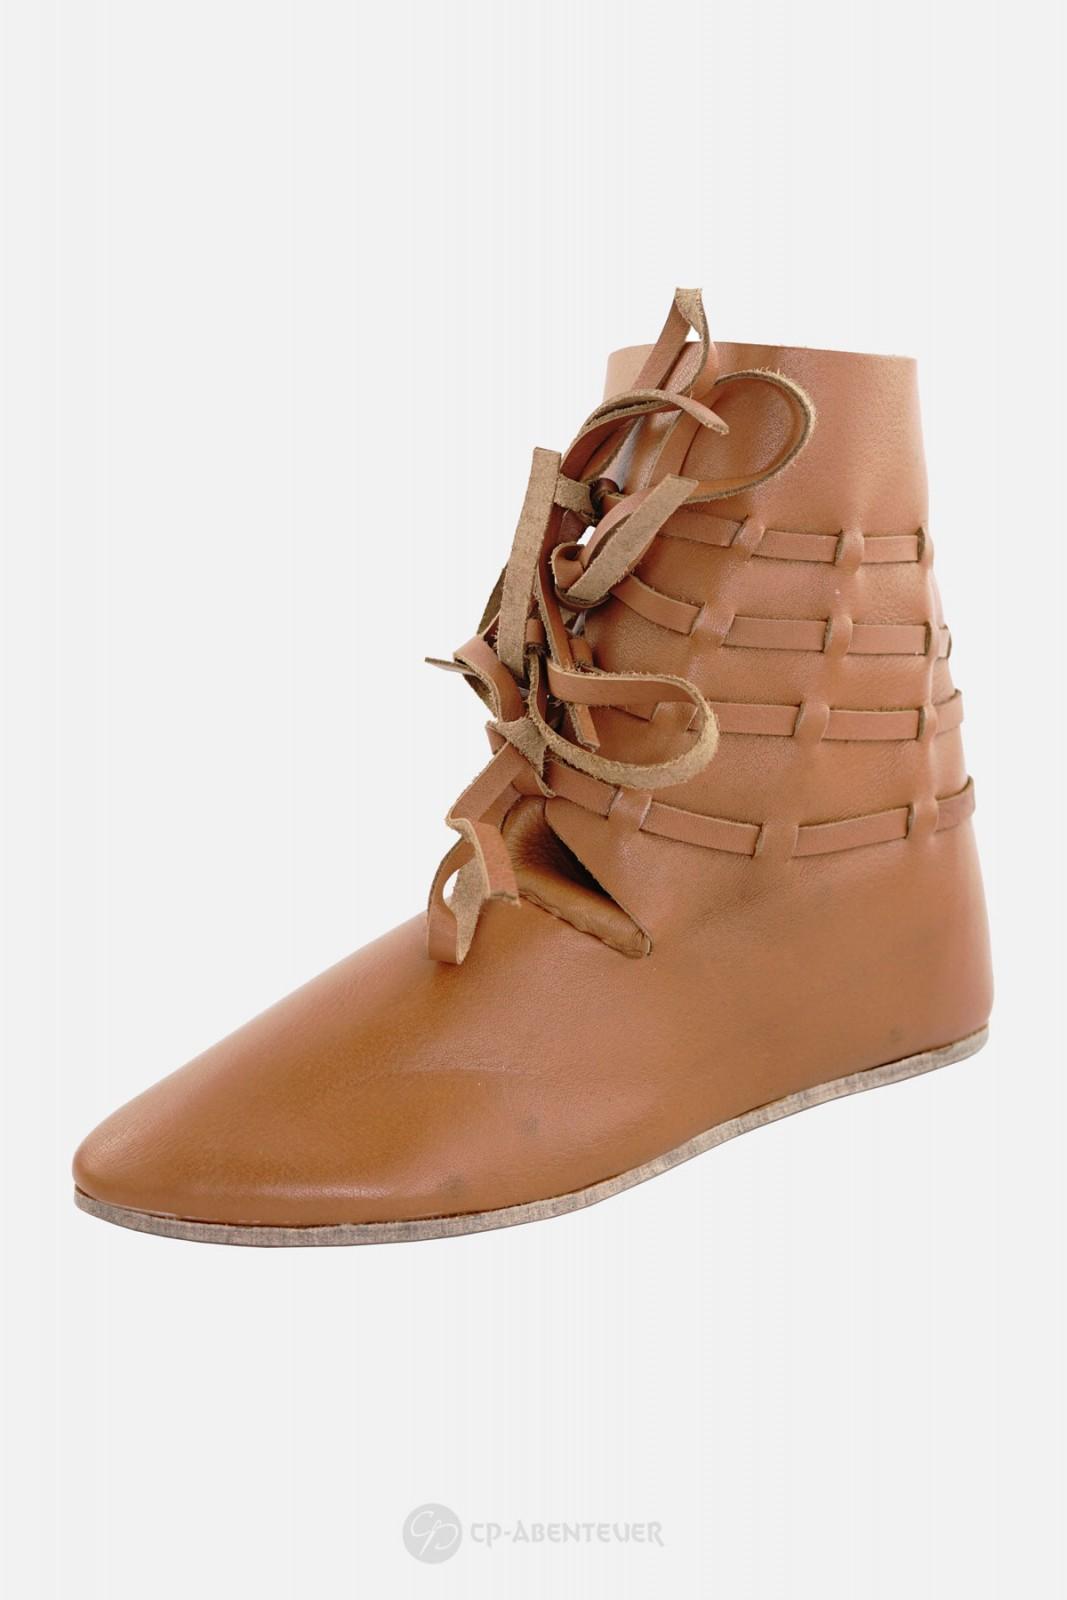 Friedrich - Schuhe